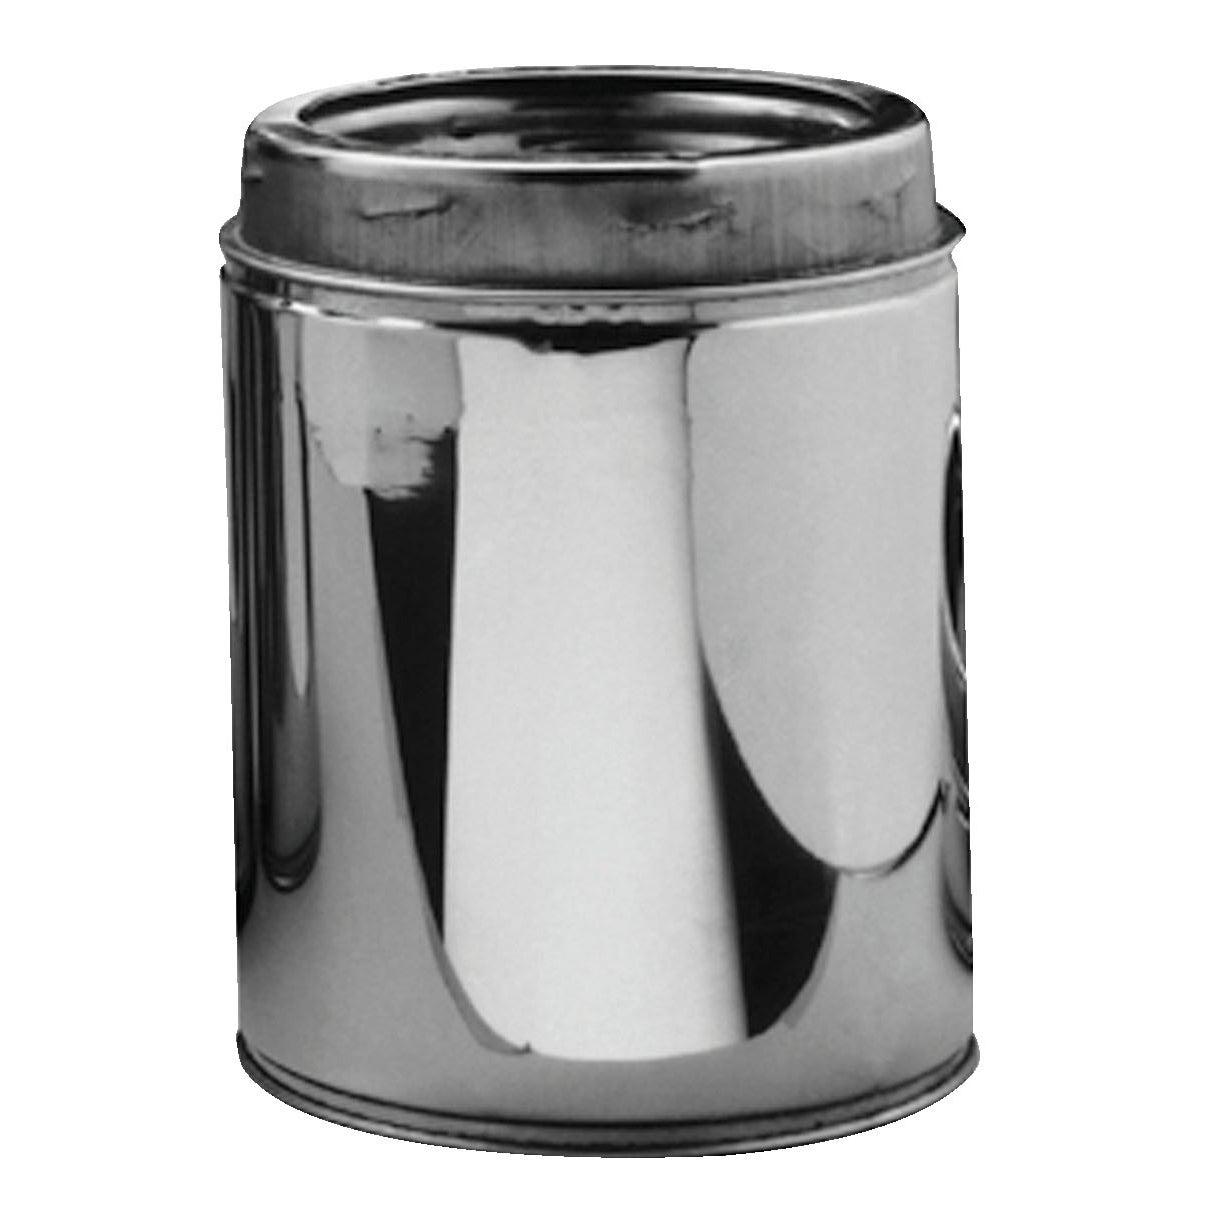 "Jensen Selkirk 6UT-6 6"" X 6"" Stainless Steel (Silver) Ins..."